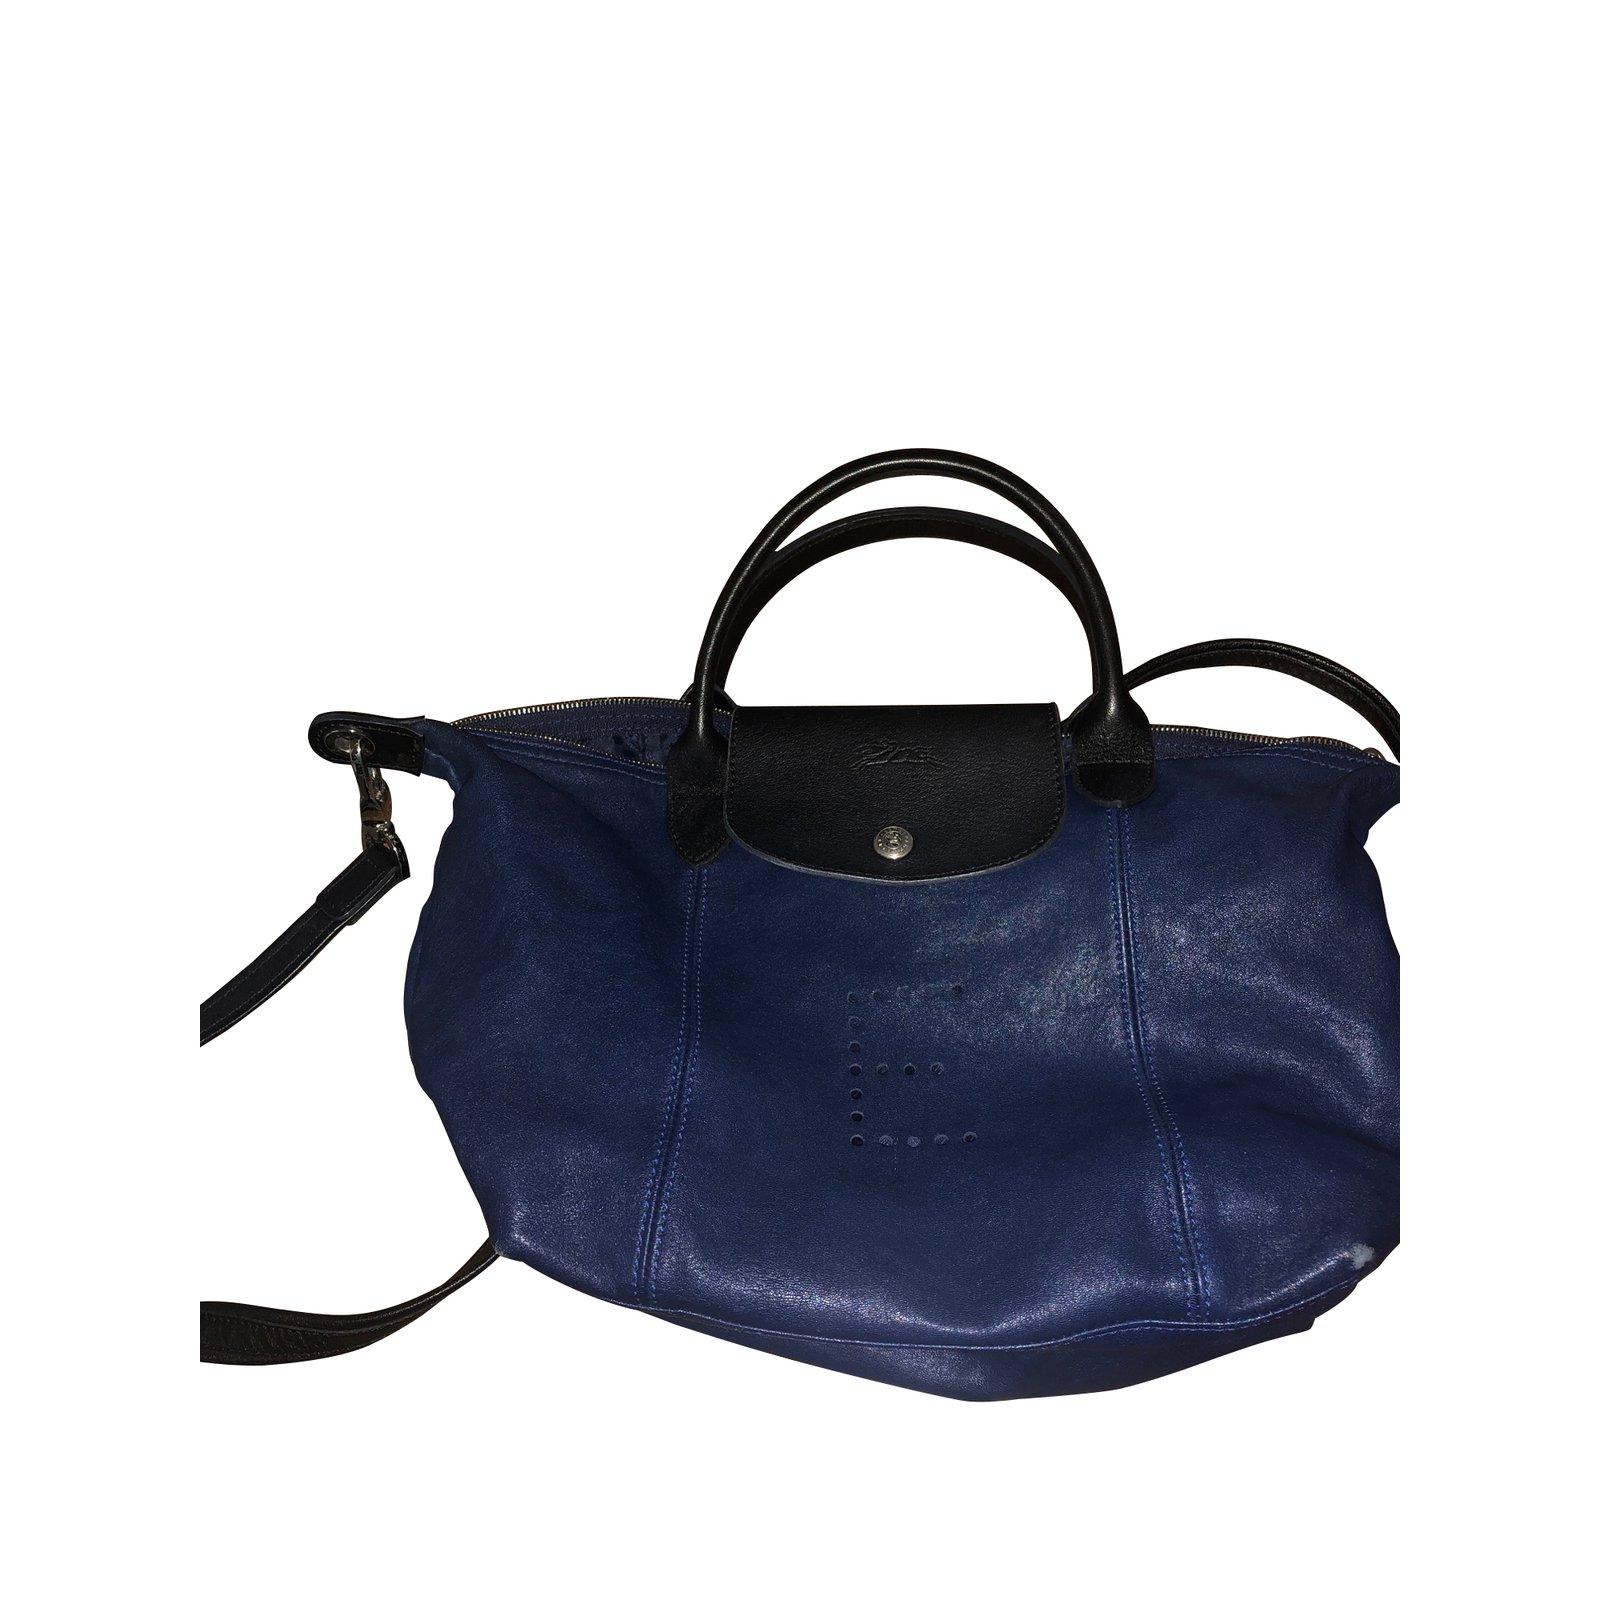 Longchamp bag folding custom leather